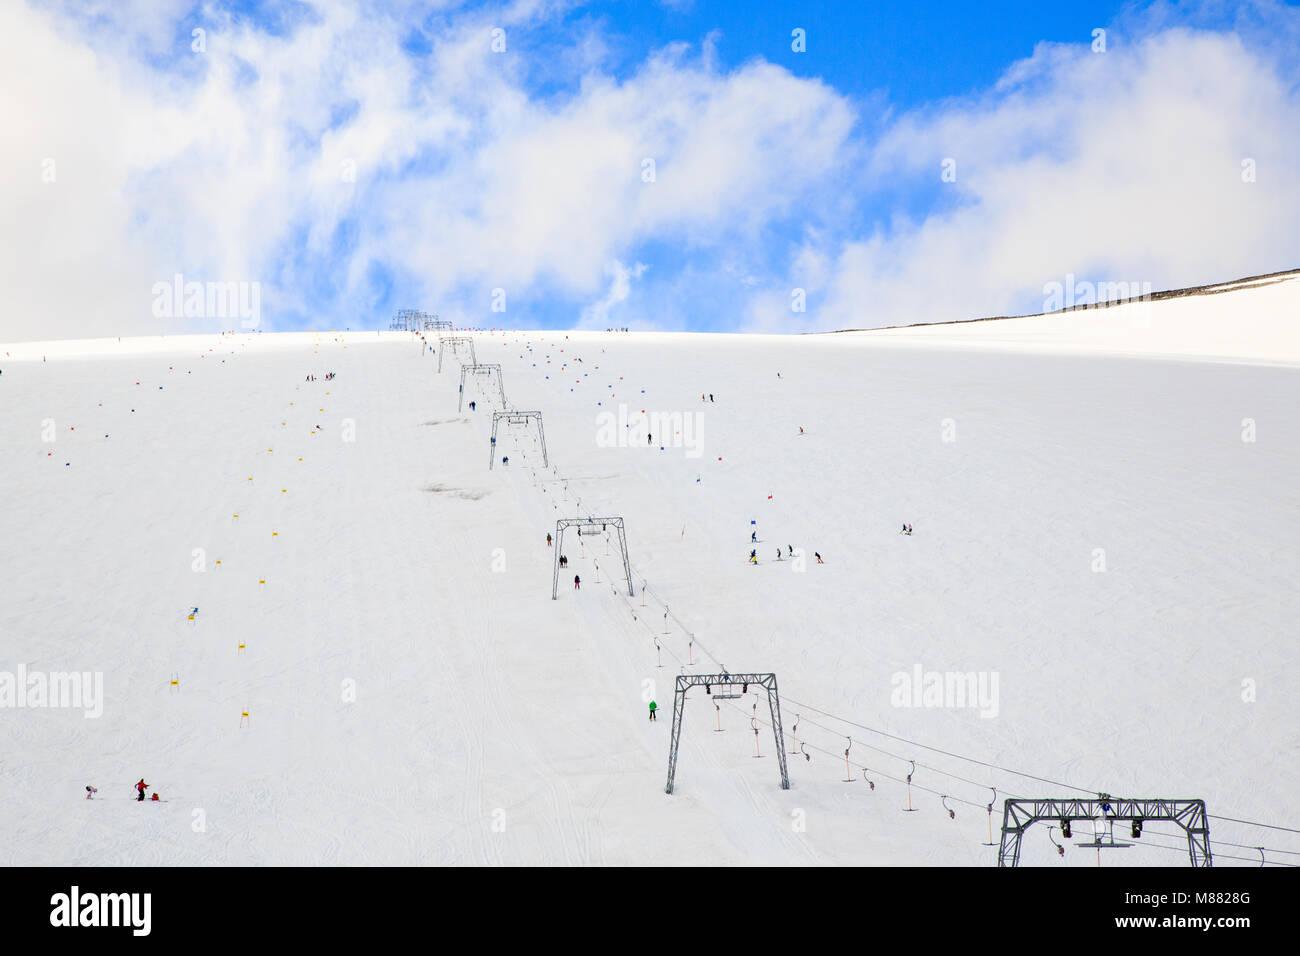 Slalom, snowboard tracks and ski lift up the mountain at Galdhøpiggen summer skiing centre, Juvass Norway - Stock Image